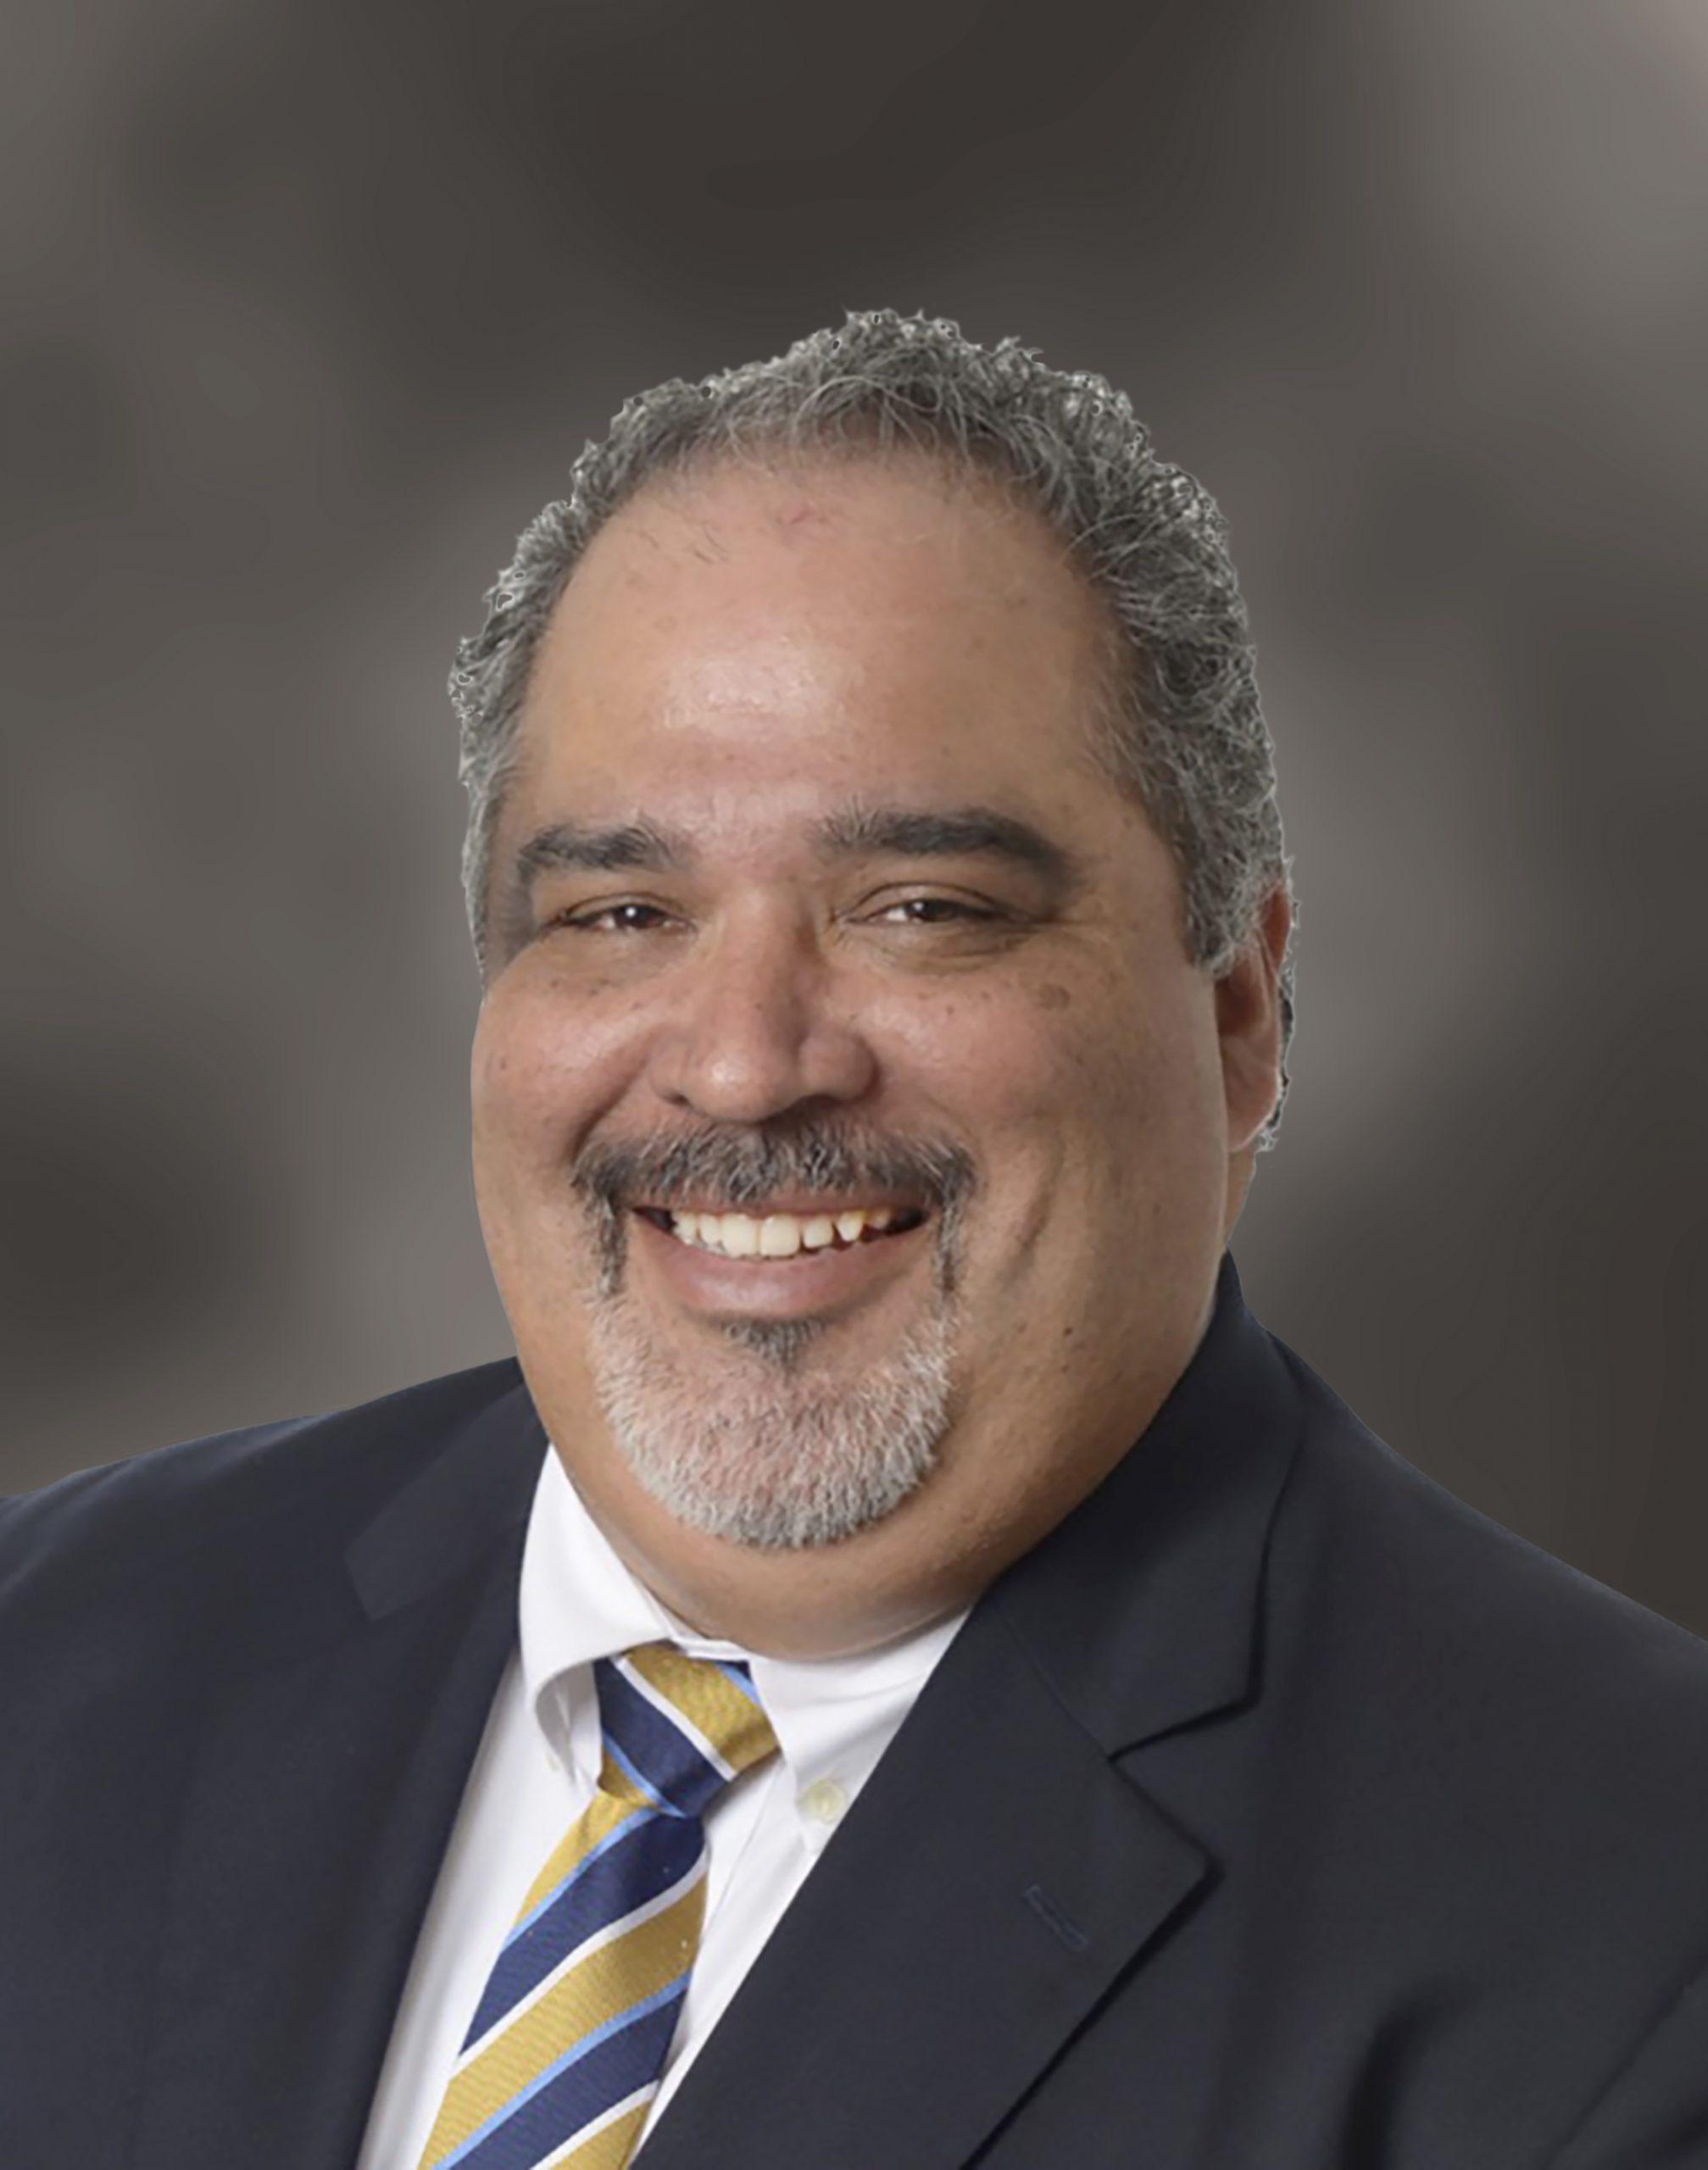 Image of Roberto Rodriguez, Trustee, Palomar Community College Governing Board